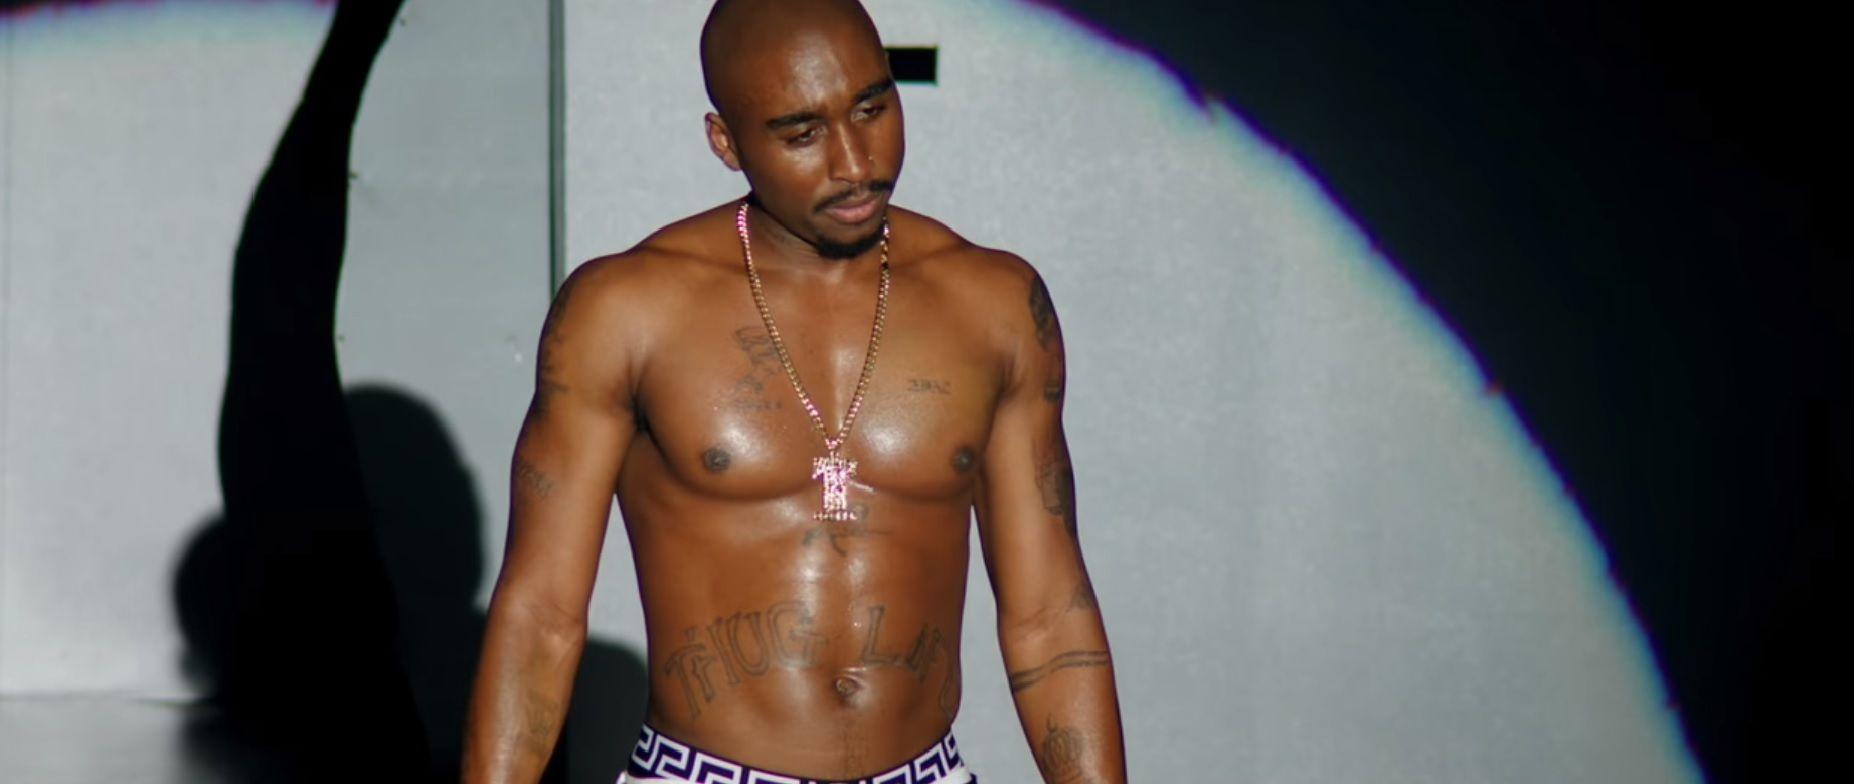 Tupac Shakur biopic - All Eyez On Me